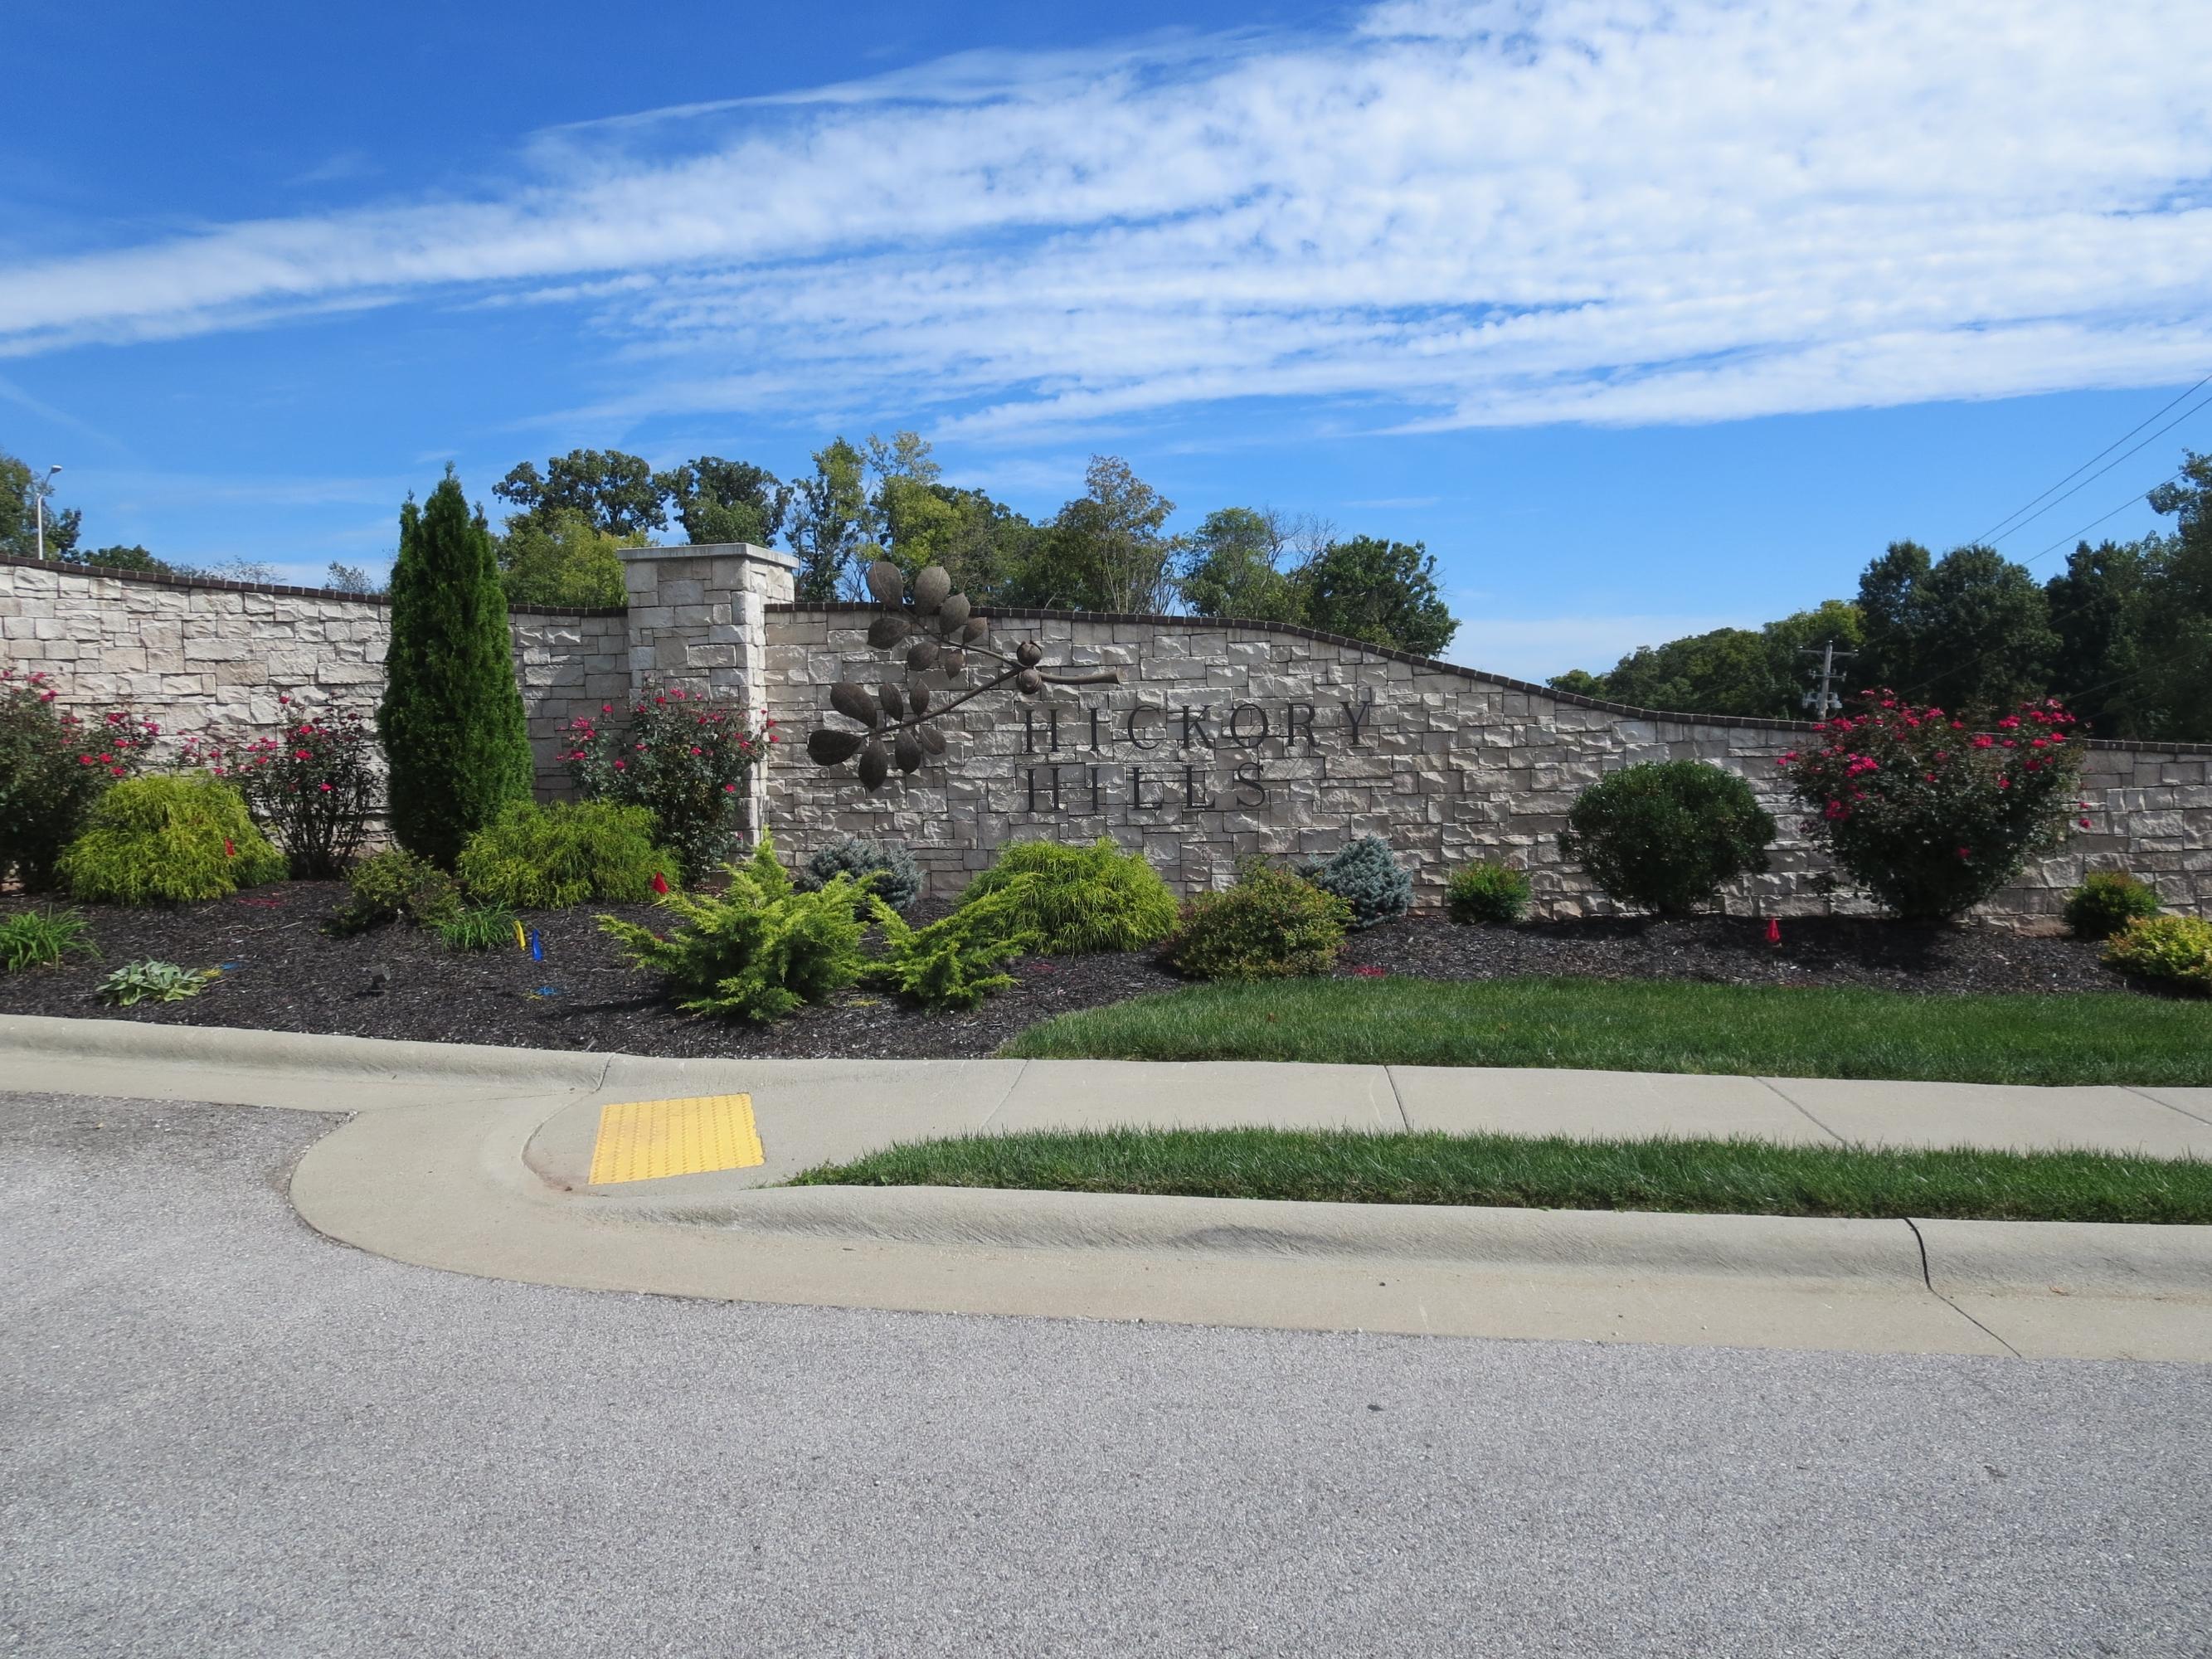 4110 East Shafter Circle, Springfield, Missouri 65809